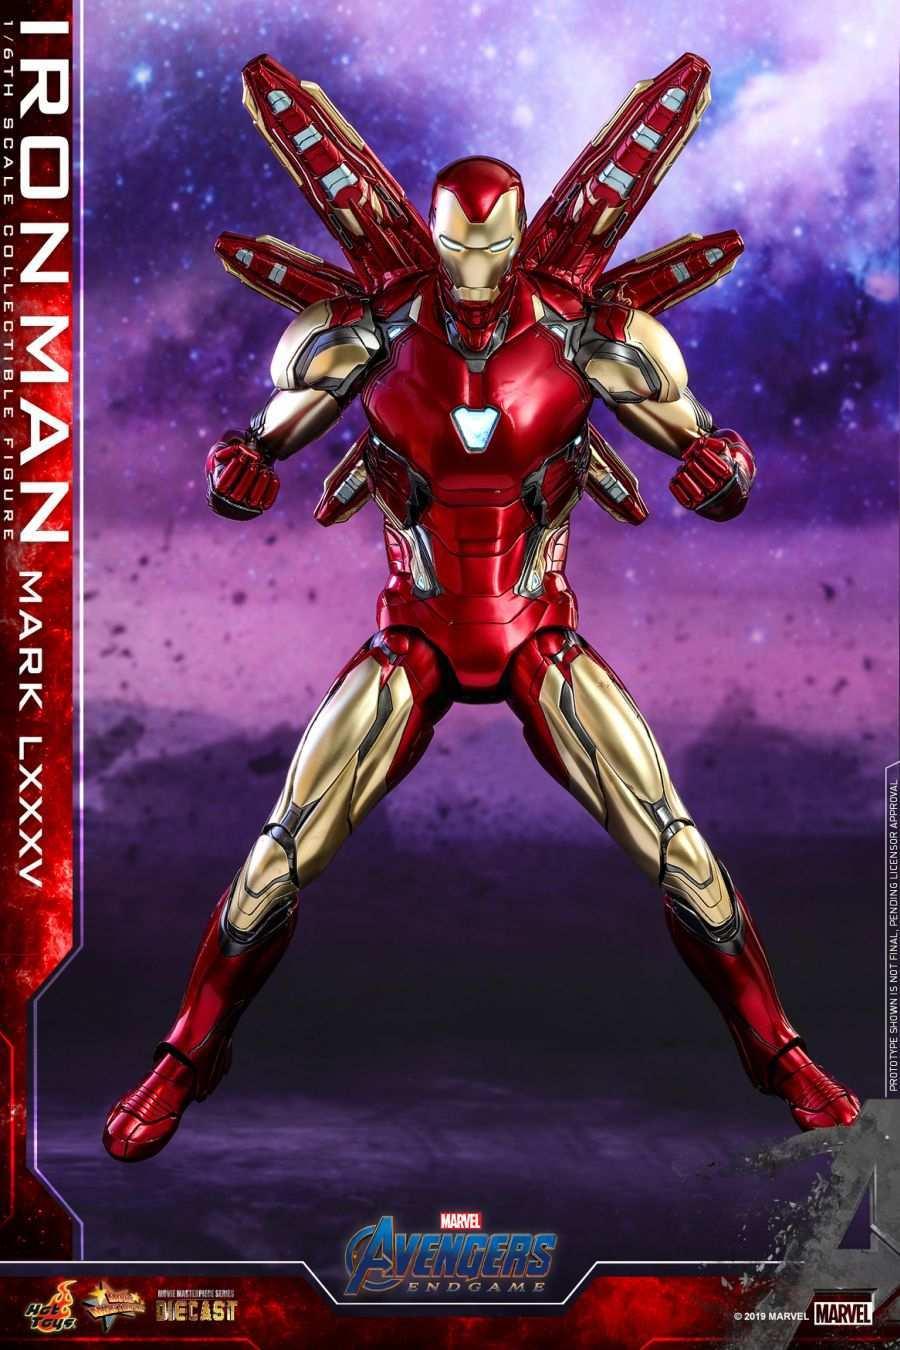 Hot Toys - Avengers 4 - Iron Man Mark LXXXV collectible figure_PR7